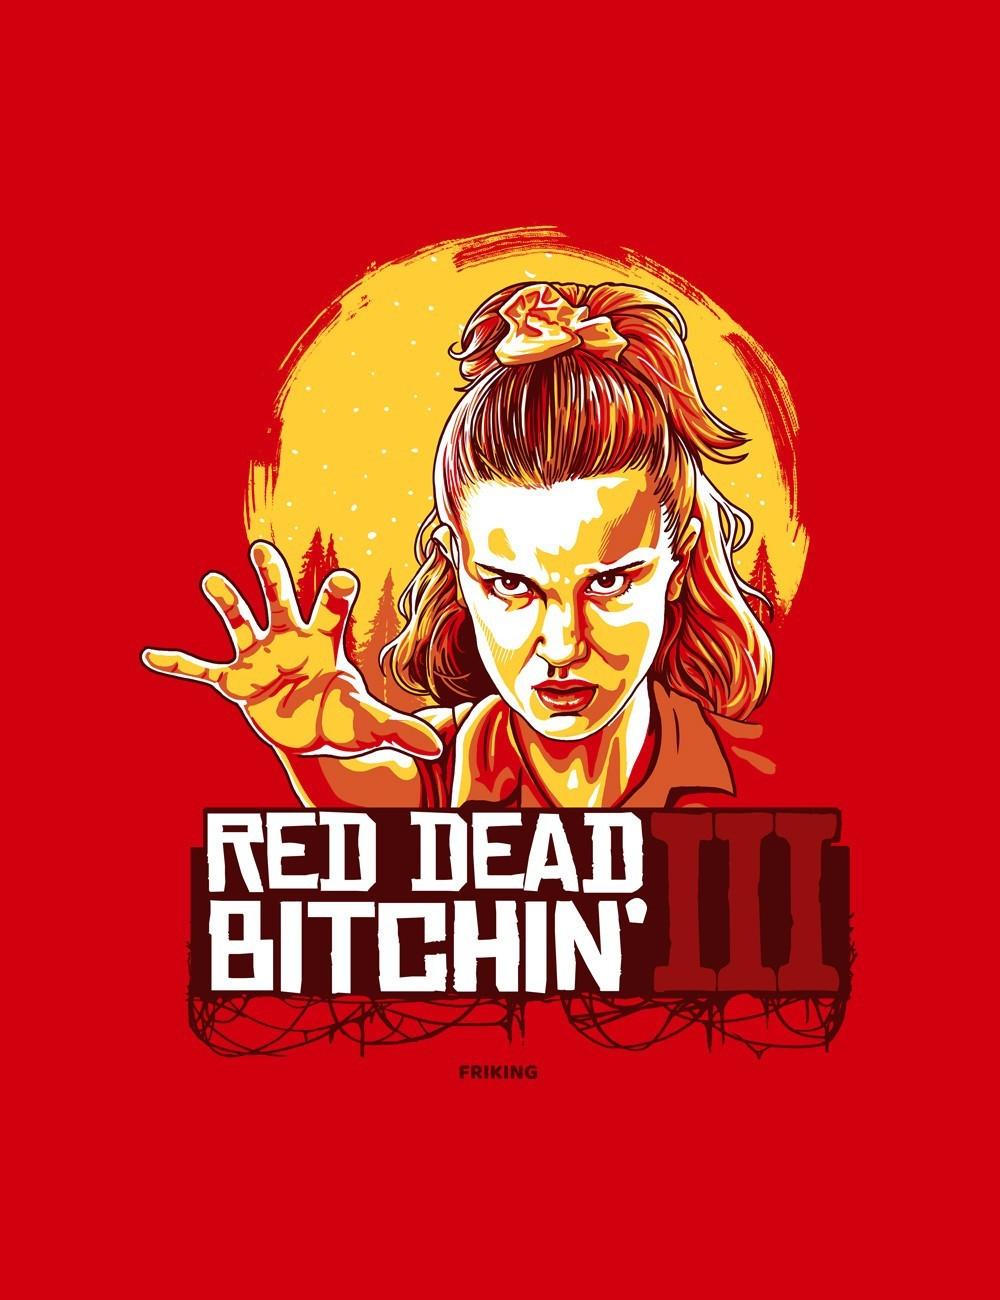 Red Dead Bitchin 3